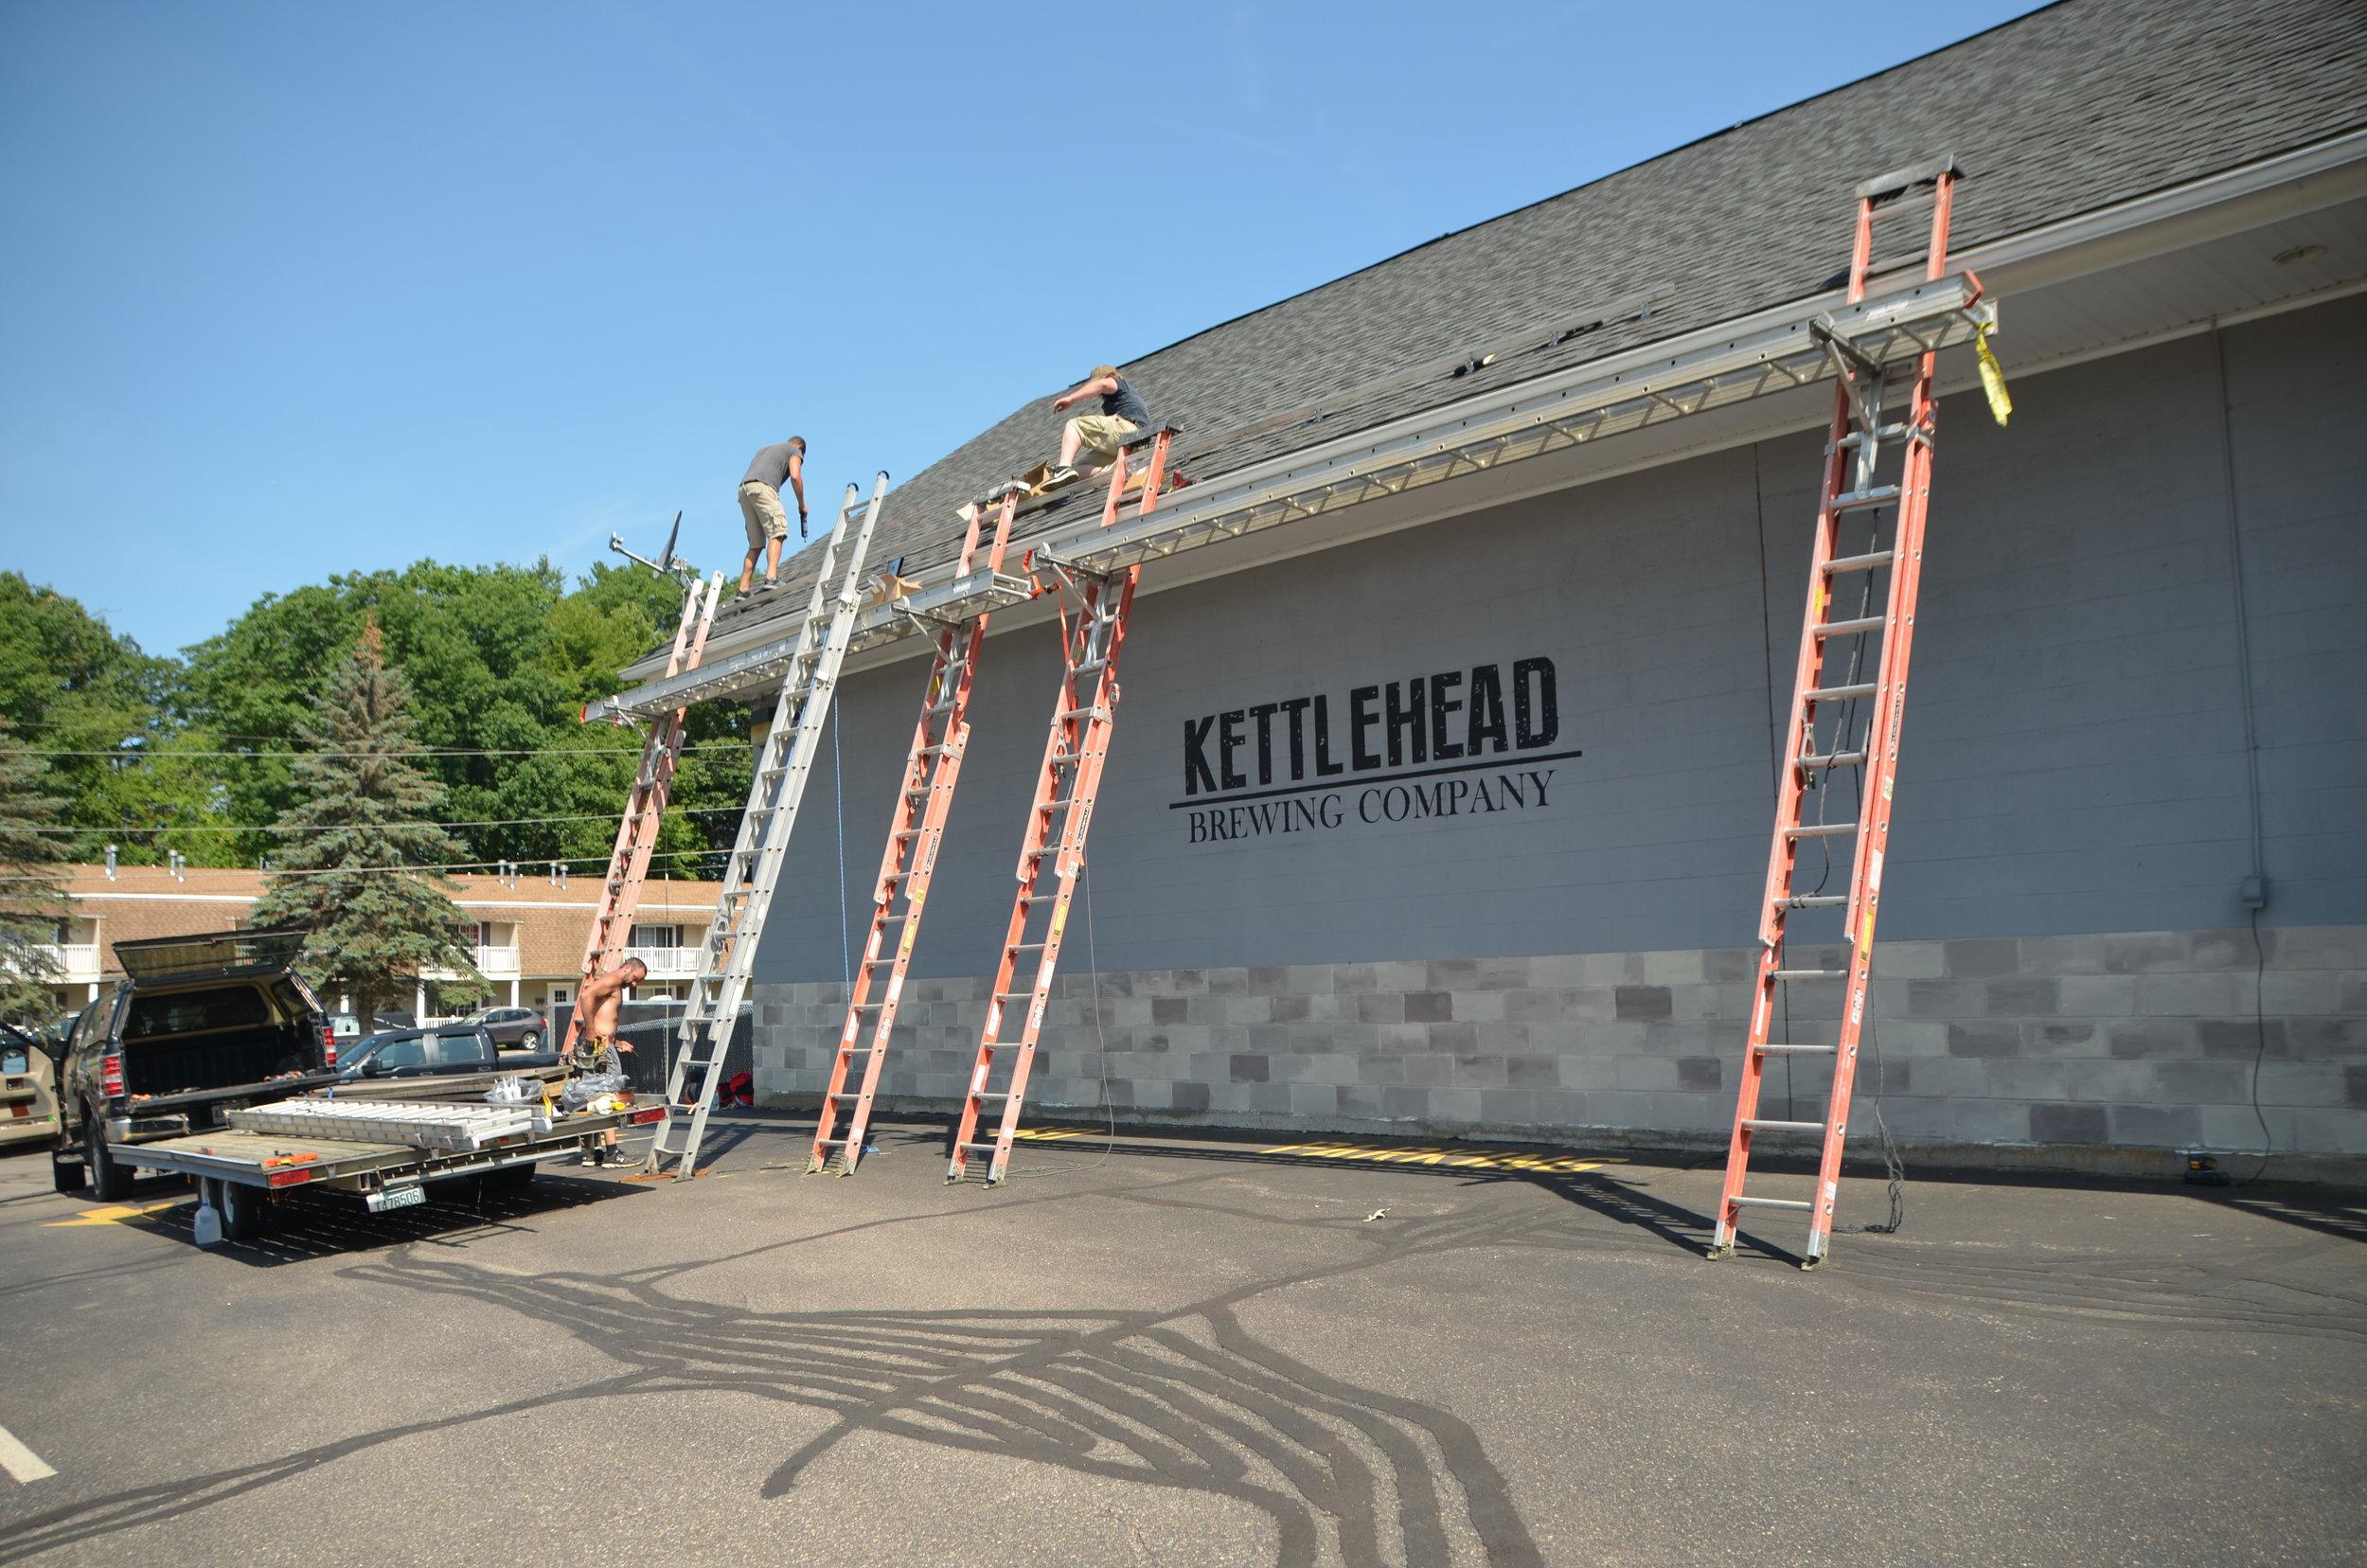 Preparing the roof for solar panels